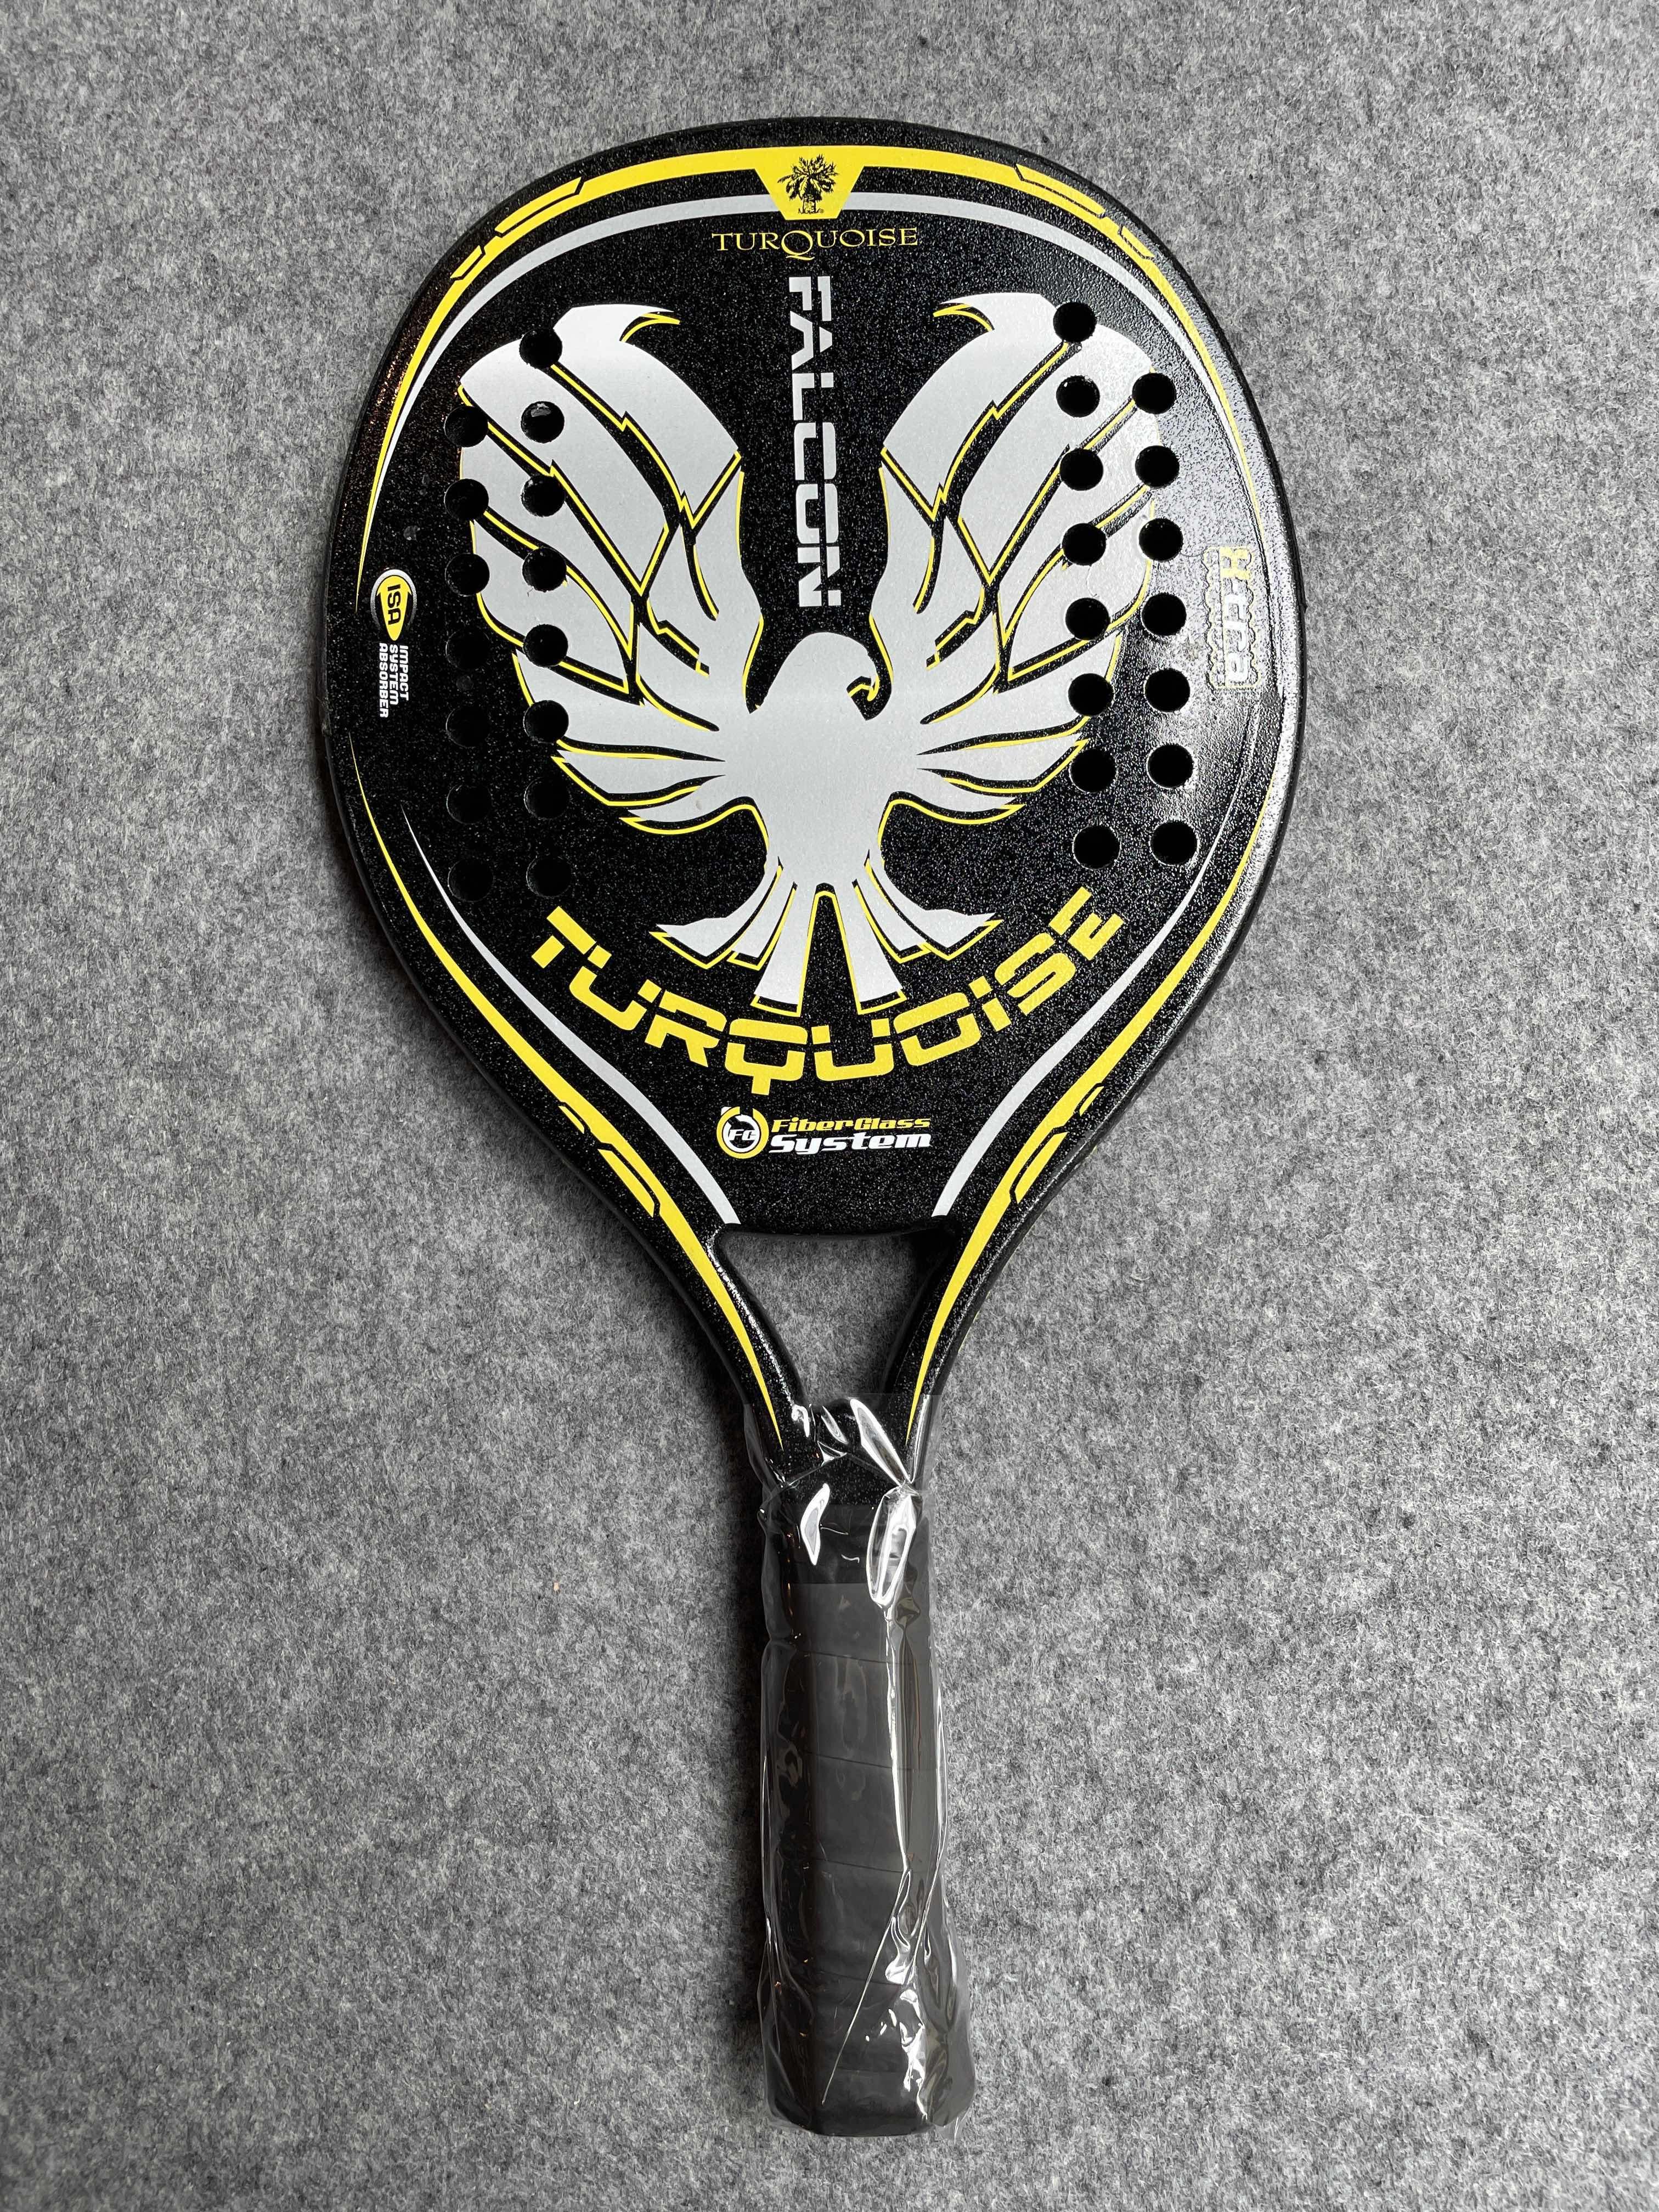 Beach Tennis Racket Professional Tennis Racquet Paddle Carbon Tennis Padel Turquoise Beach Dampener Raquete De Tennis MBT